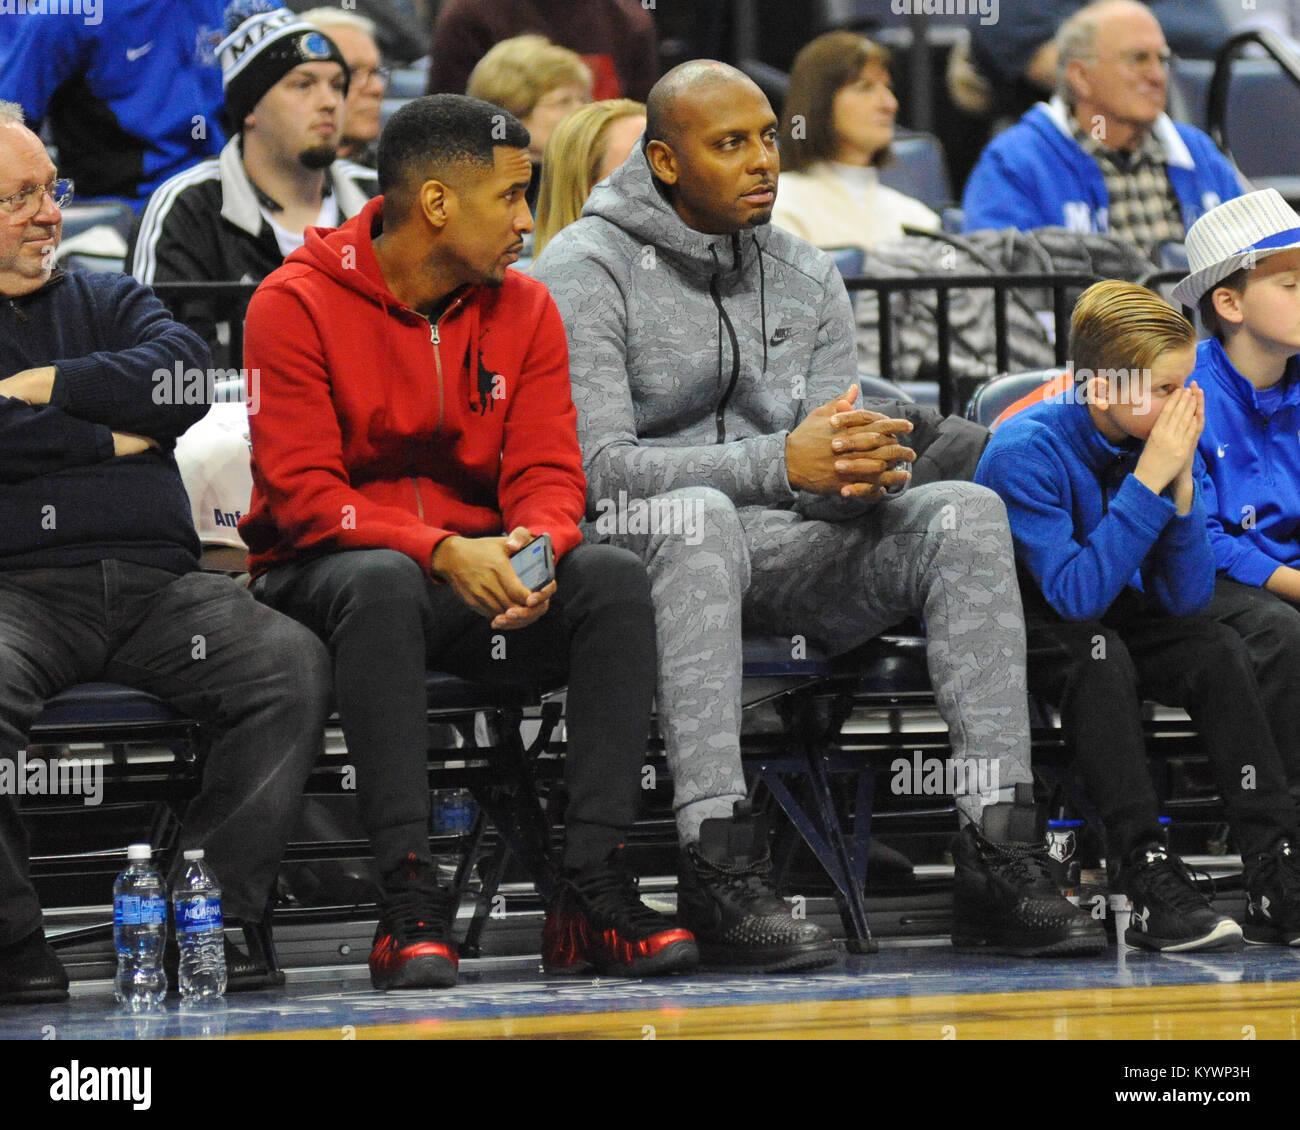 super popular a0484 51fe3 The Half. 16th Jan, 2018. MS, USA  Retired NBA point guard